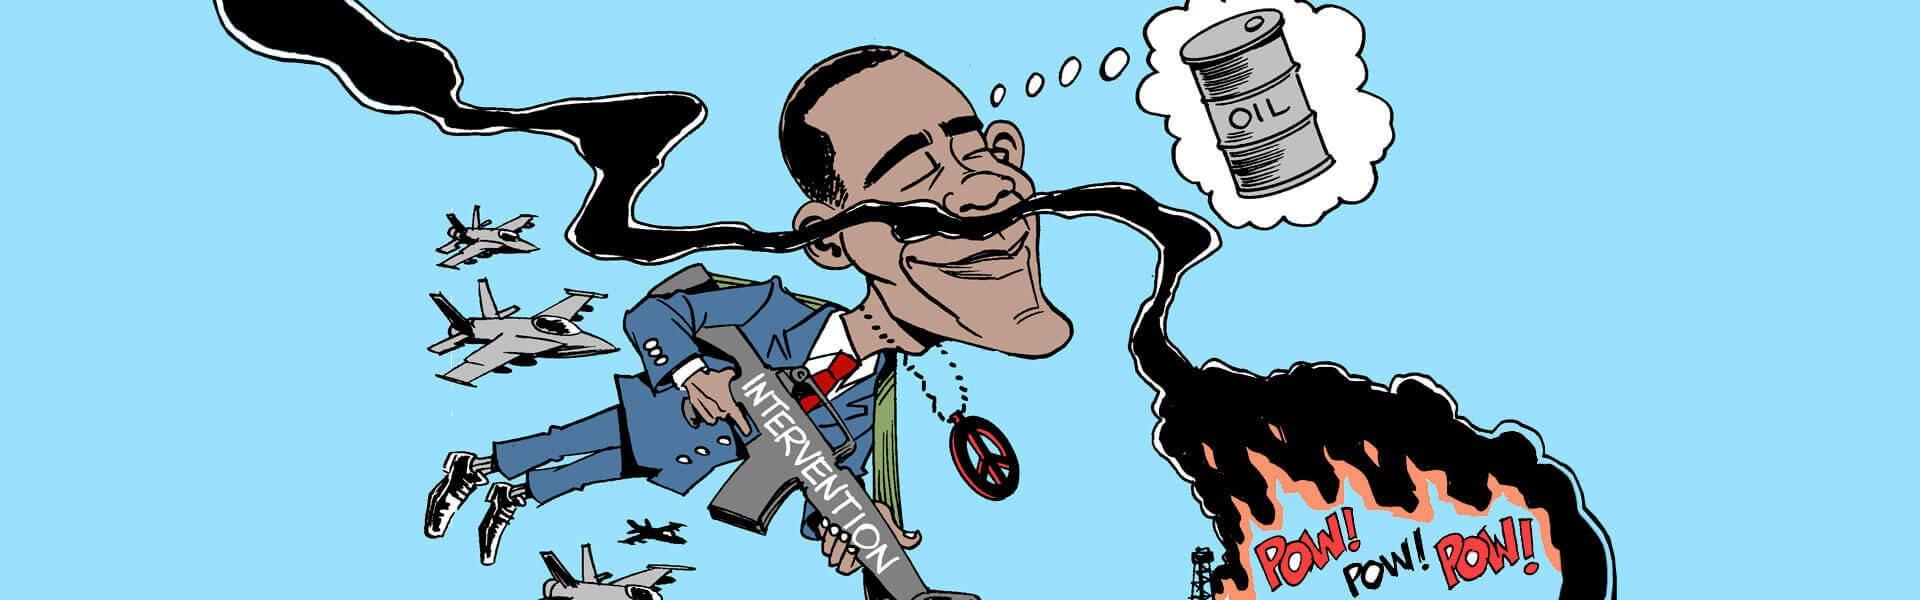 barack obama second term